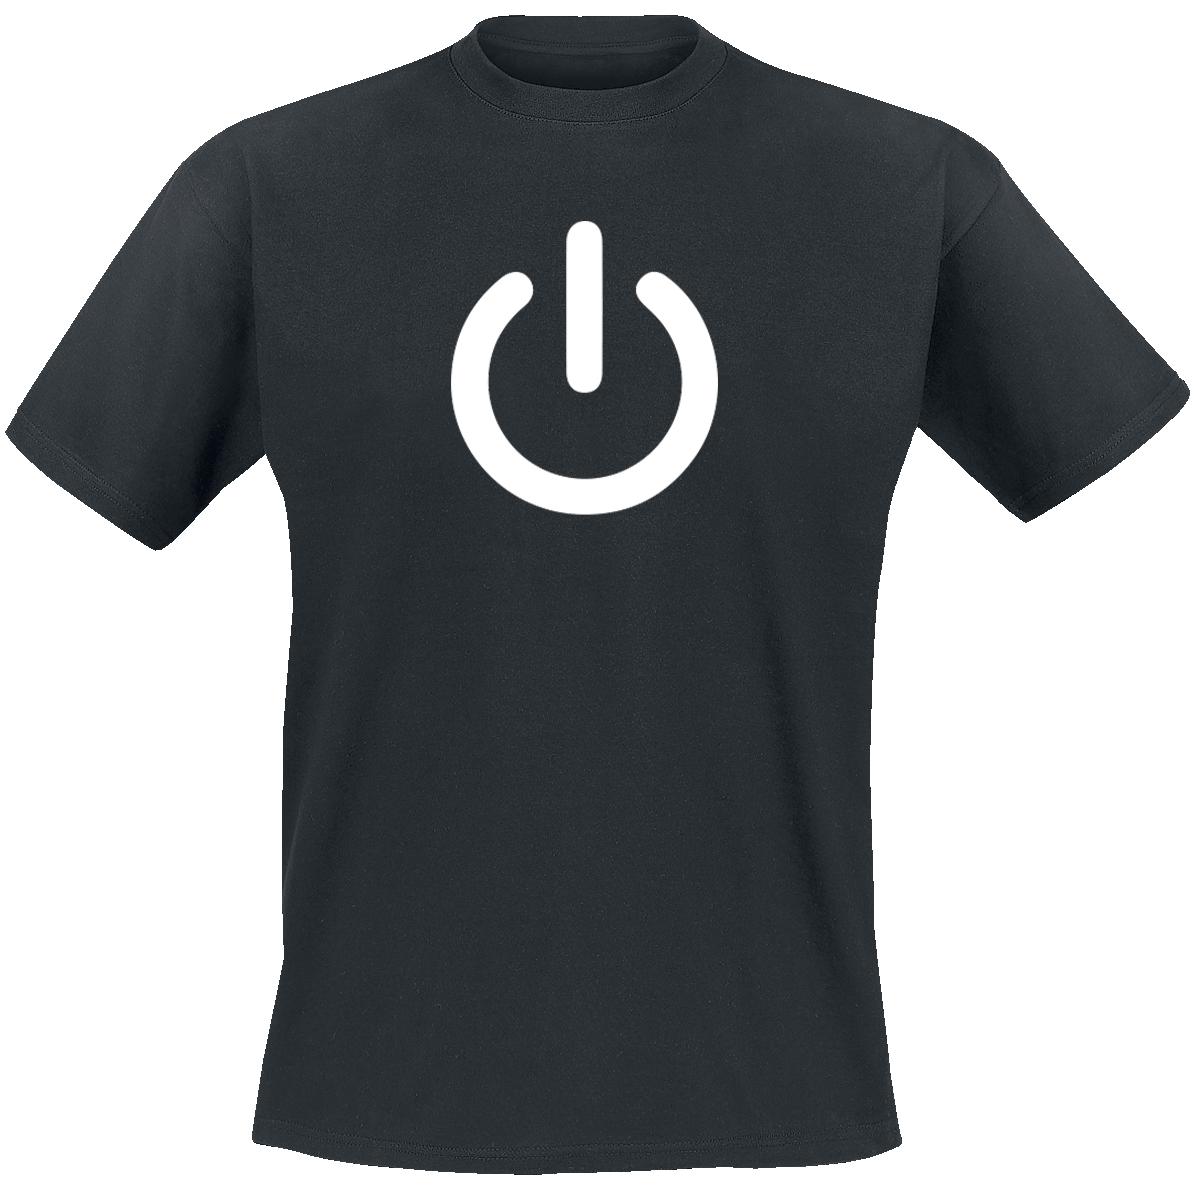 Power Off -  - T-Shirt - black image